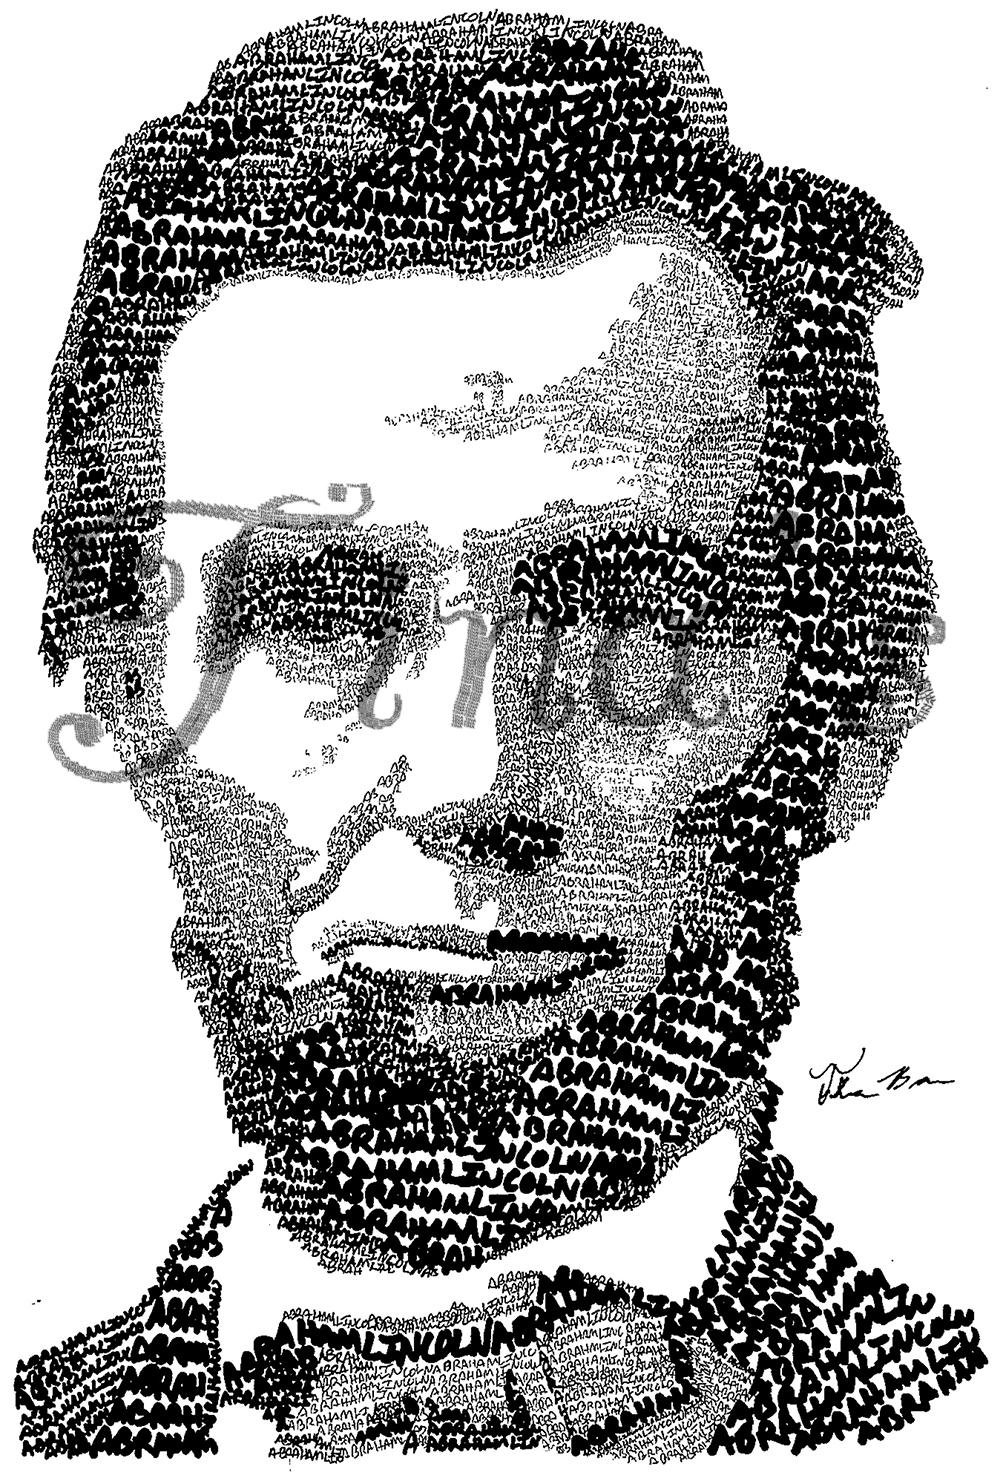 Abe+nw.jpg